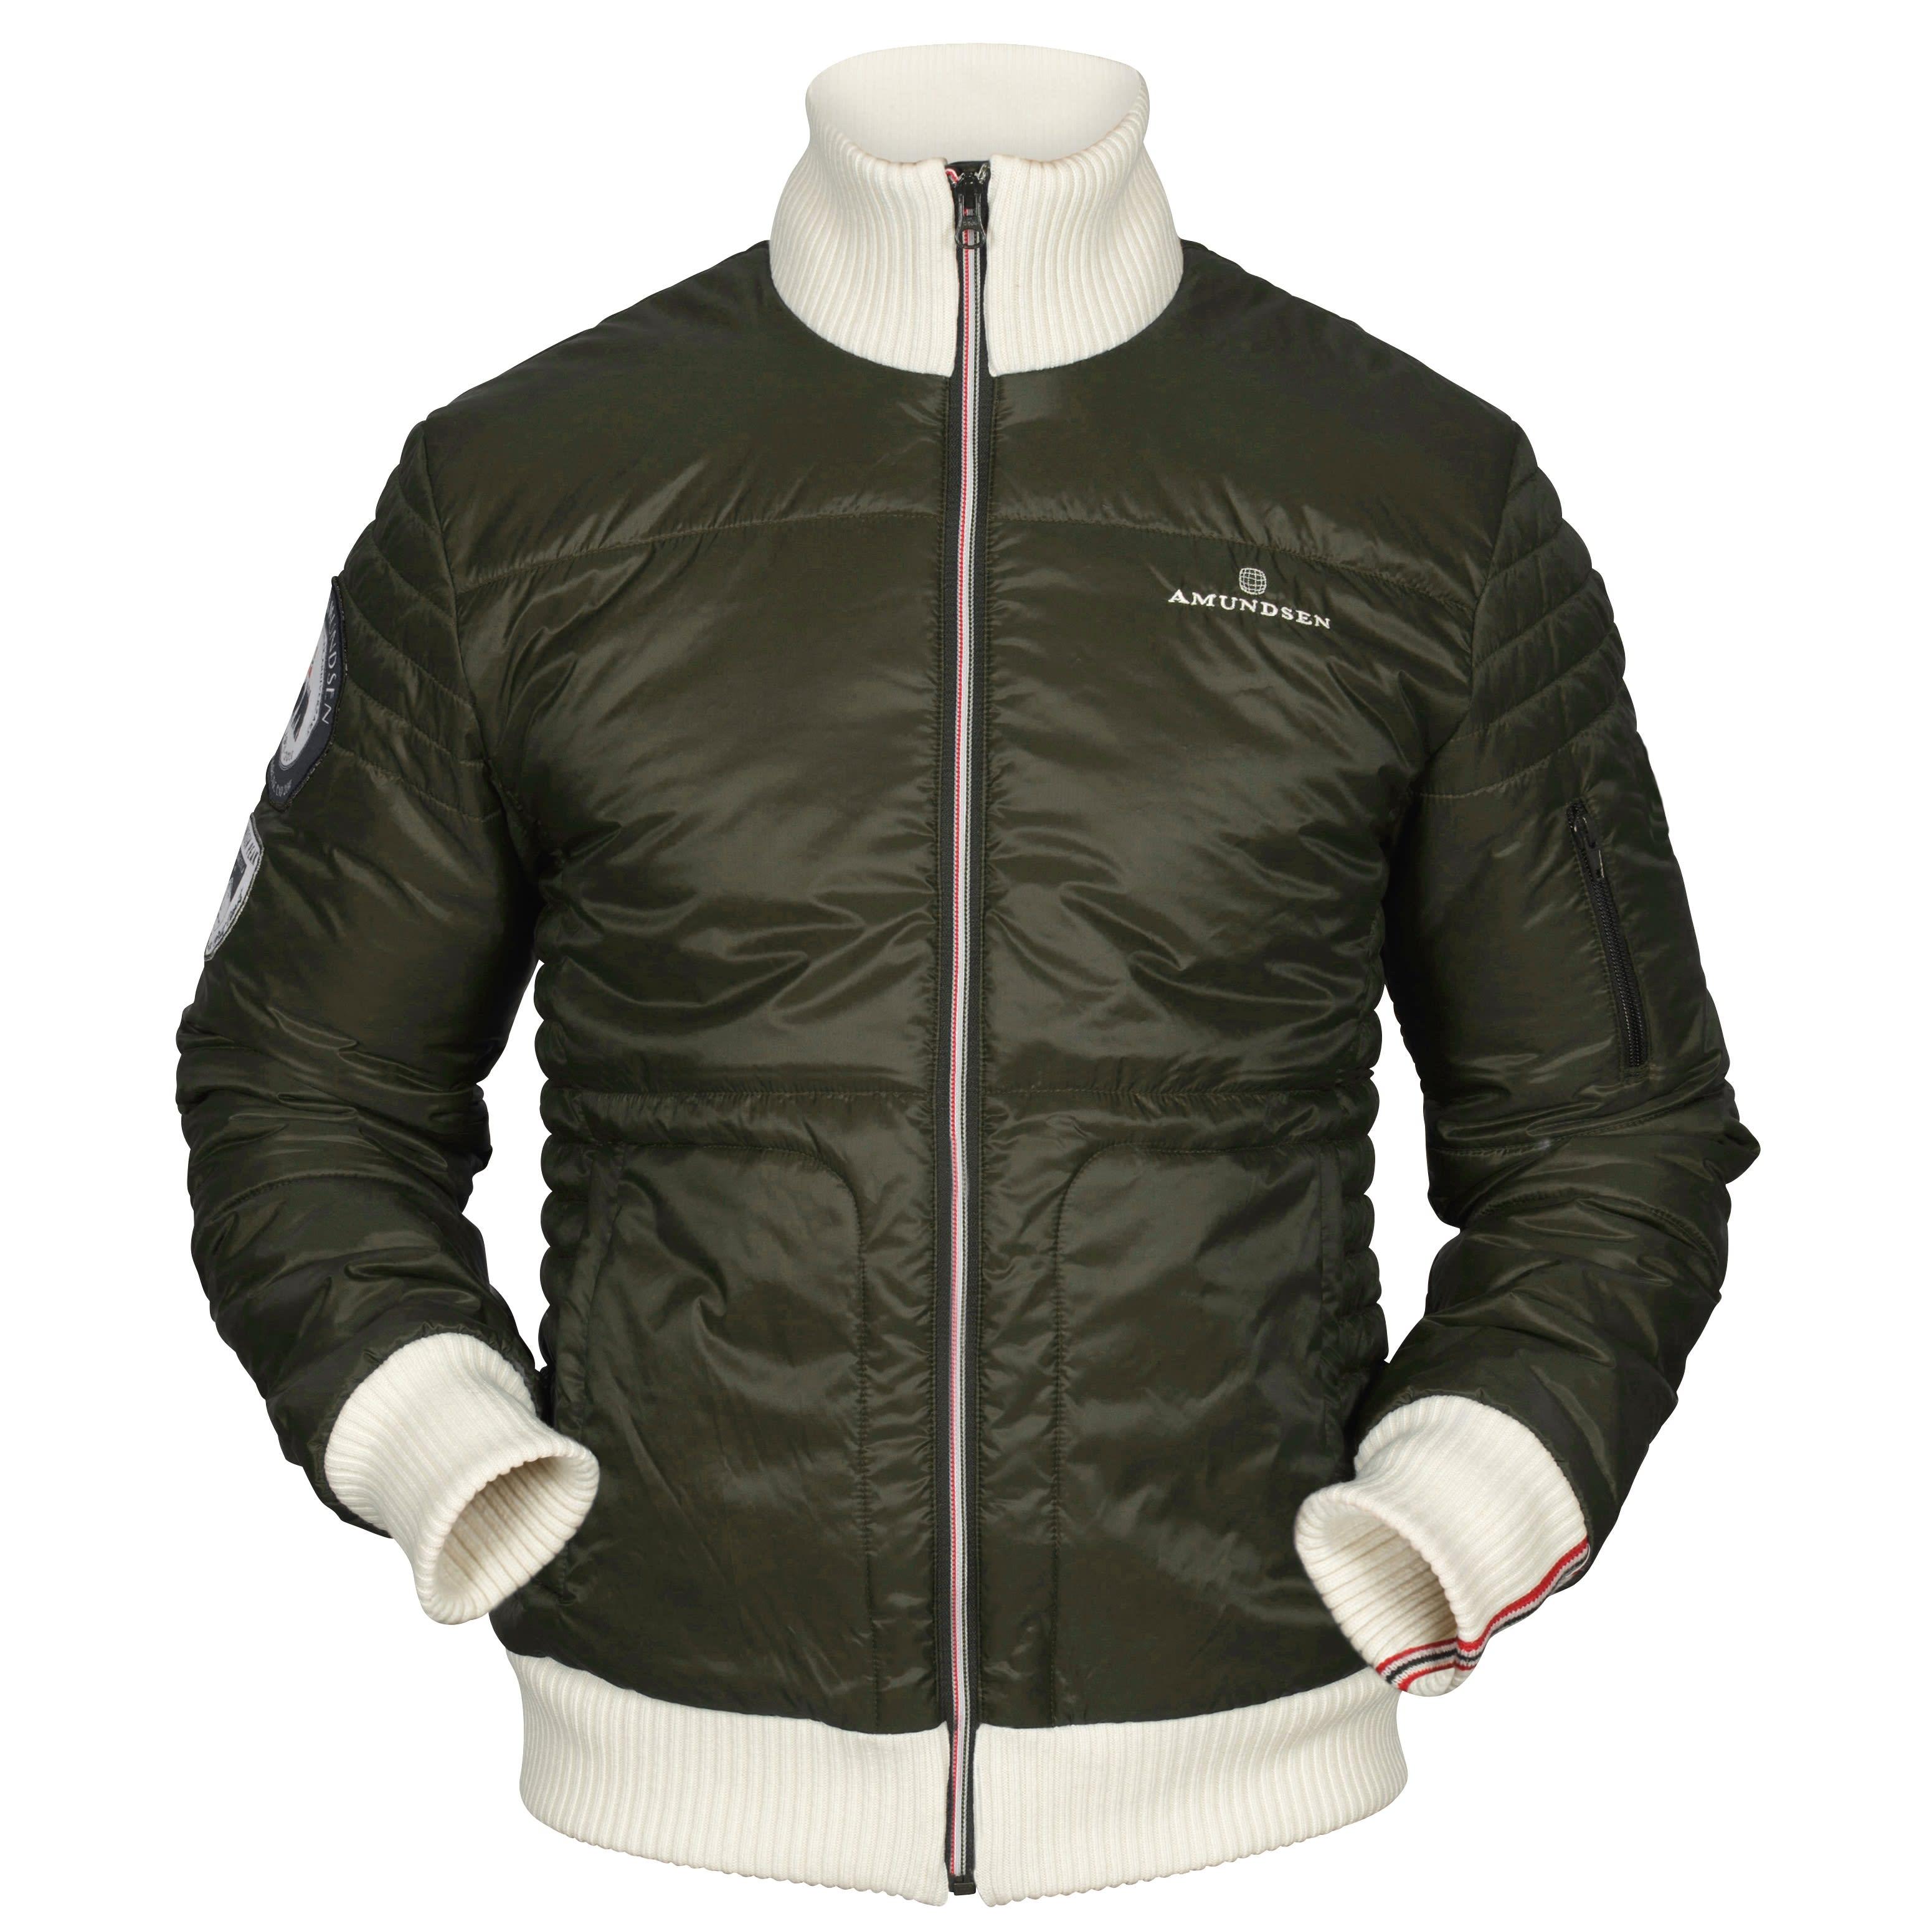 Kjøp Amundsen Breguet Jacket Men's fra Outnorth